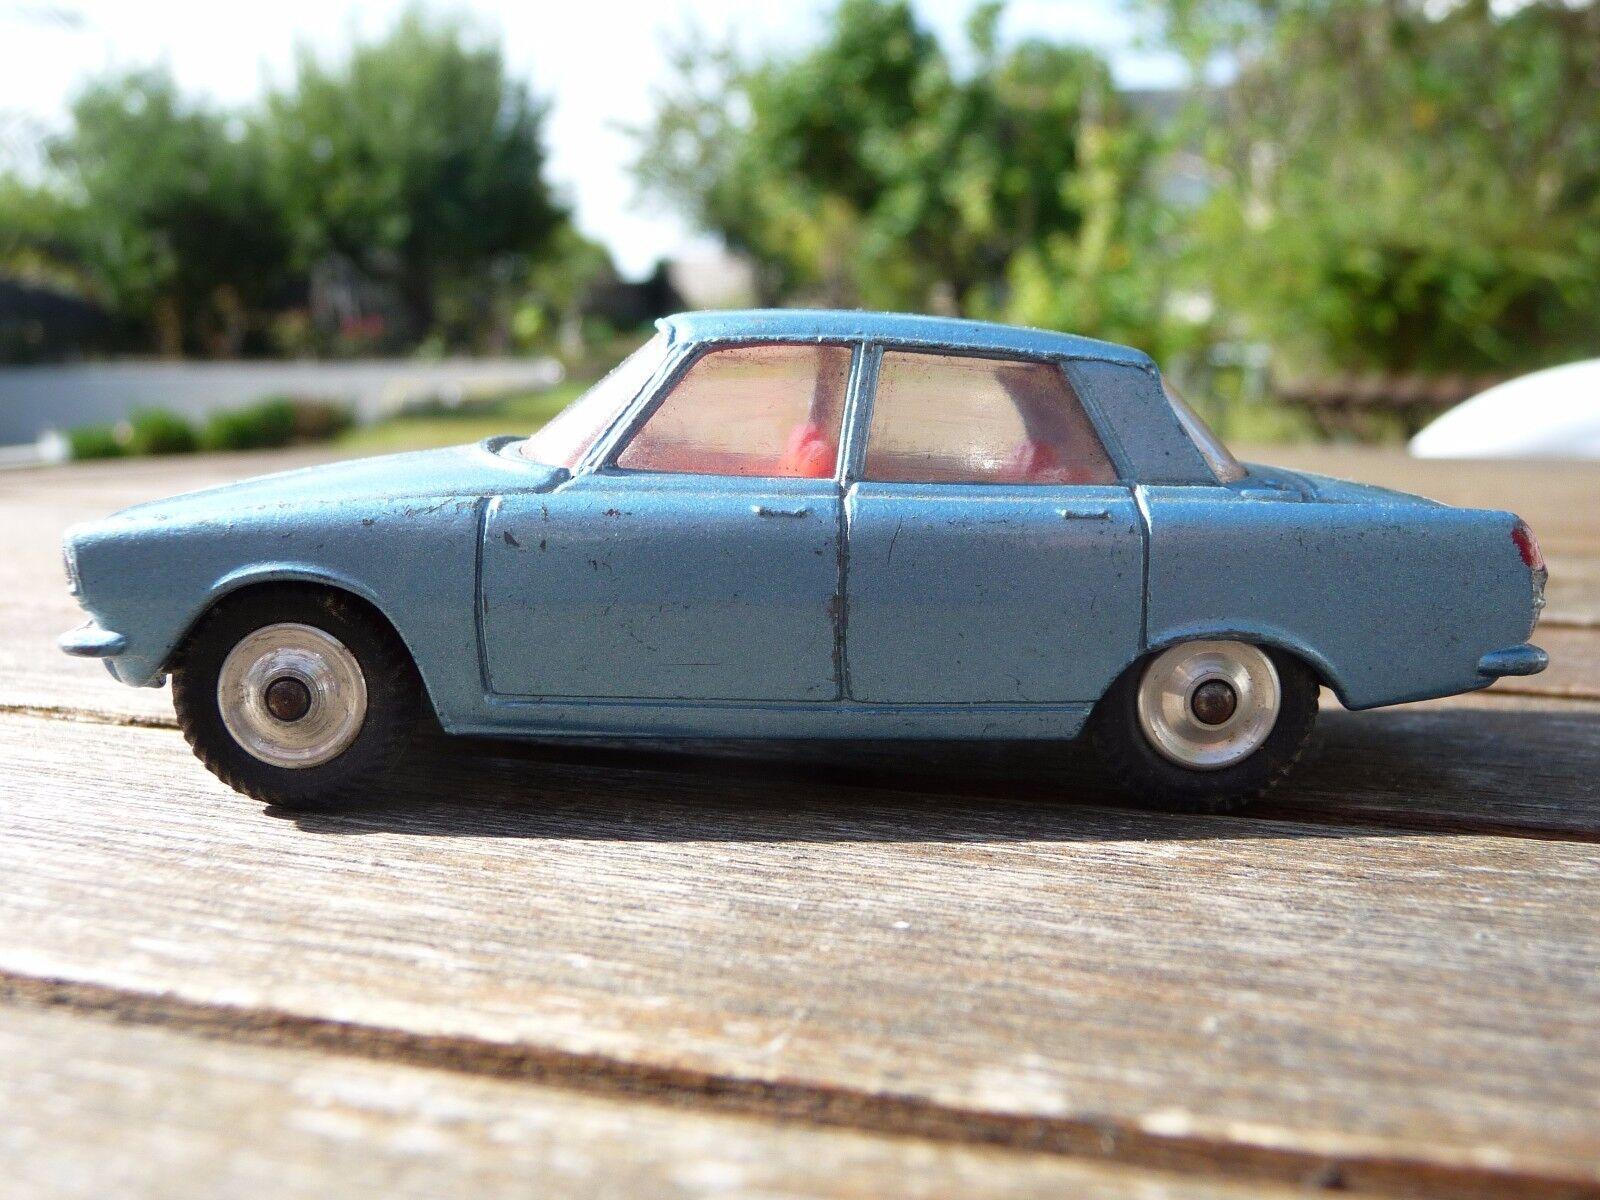 Superbe   CORGI TOYS Rover 2000 Excellent état A saisir   Très très rare